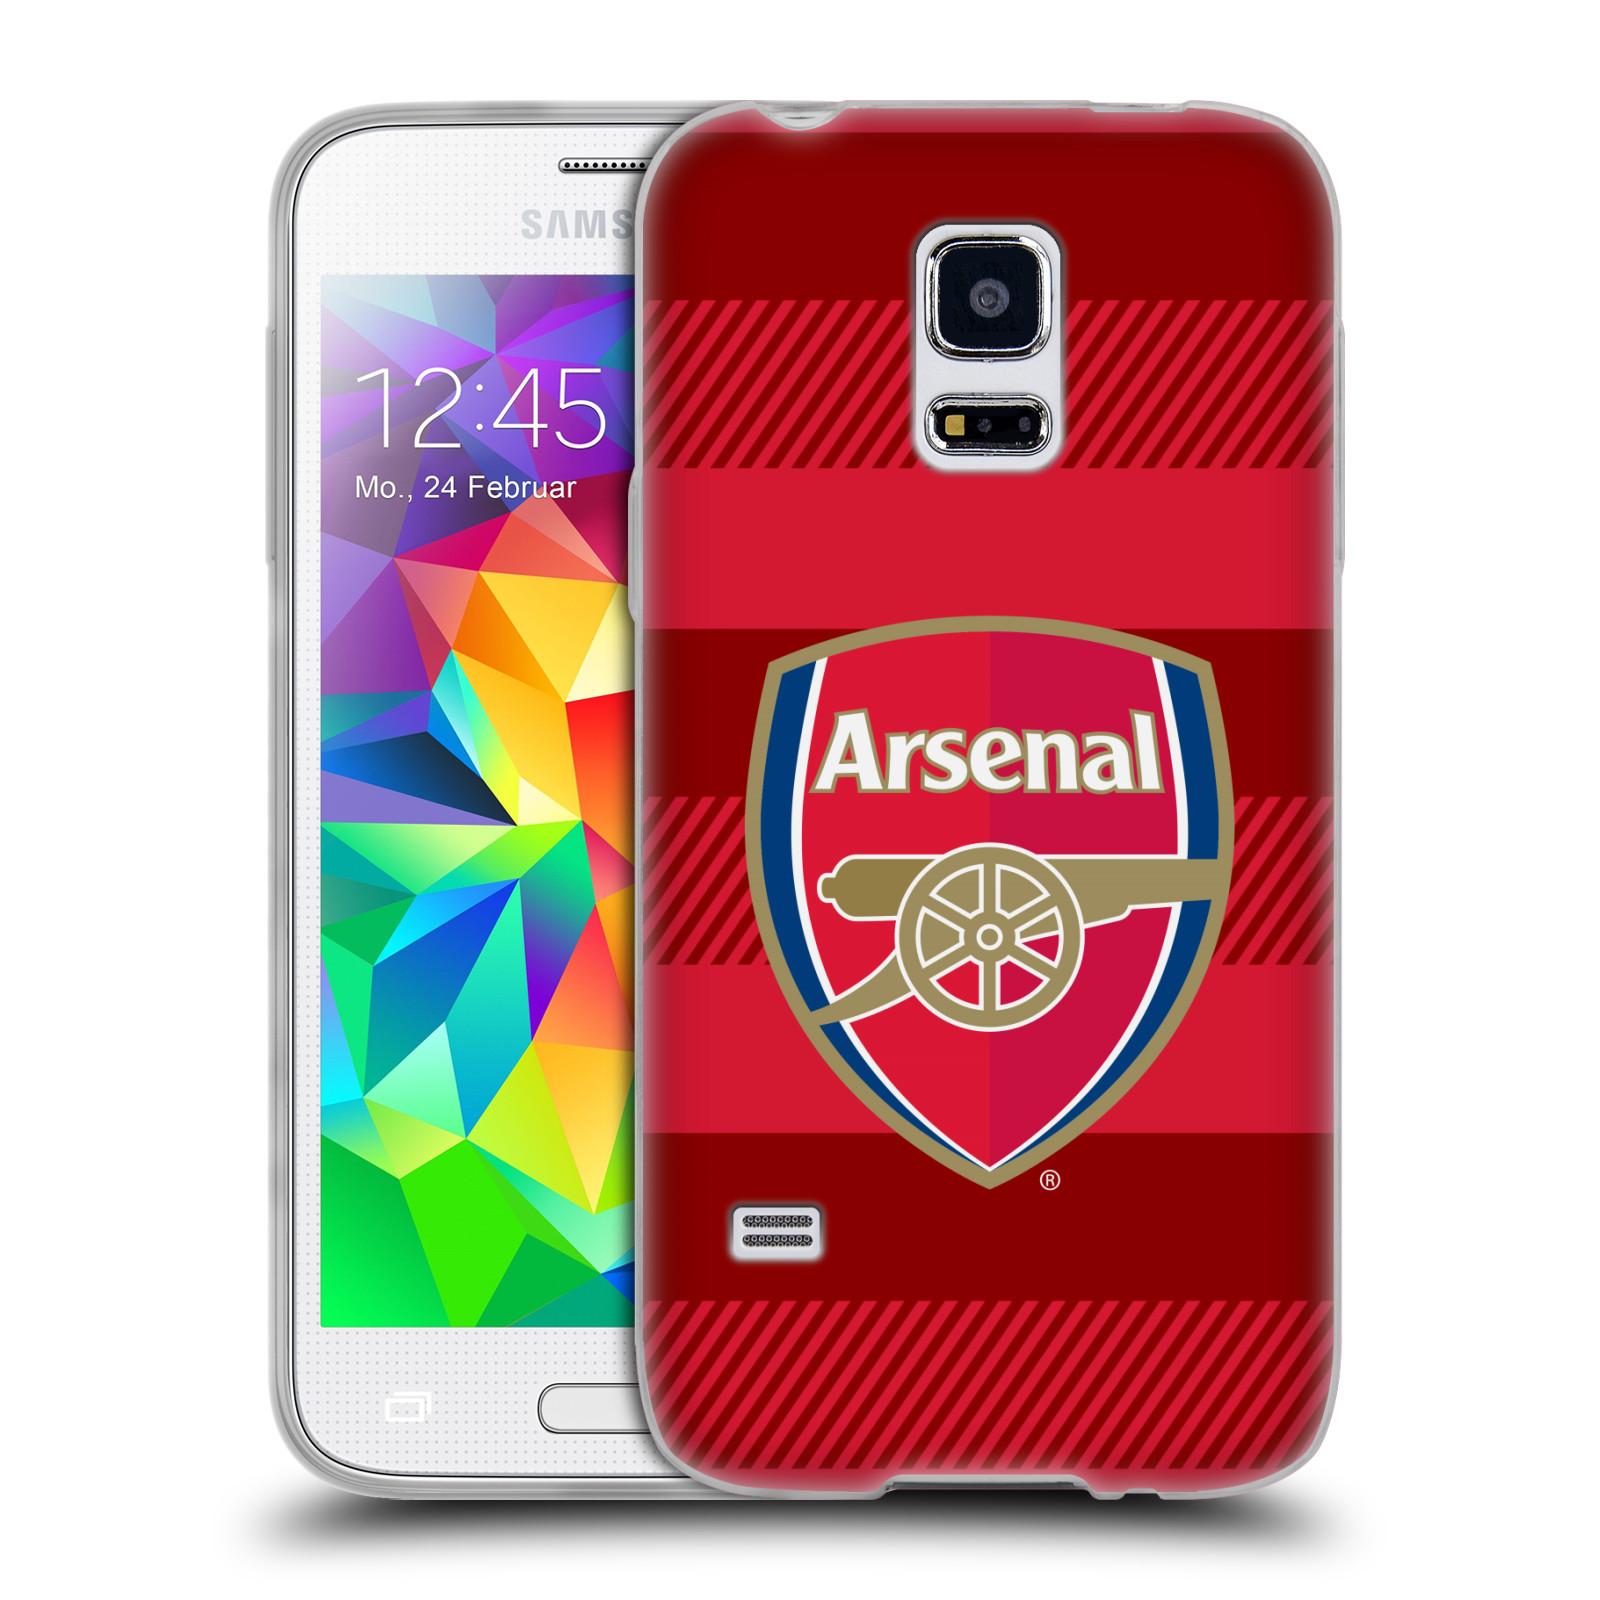 Silikonové pouzdro na mobil Samsung Galaxy S5 Mini - Head Case - Arsenal FC - Logo s pruhy